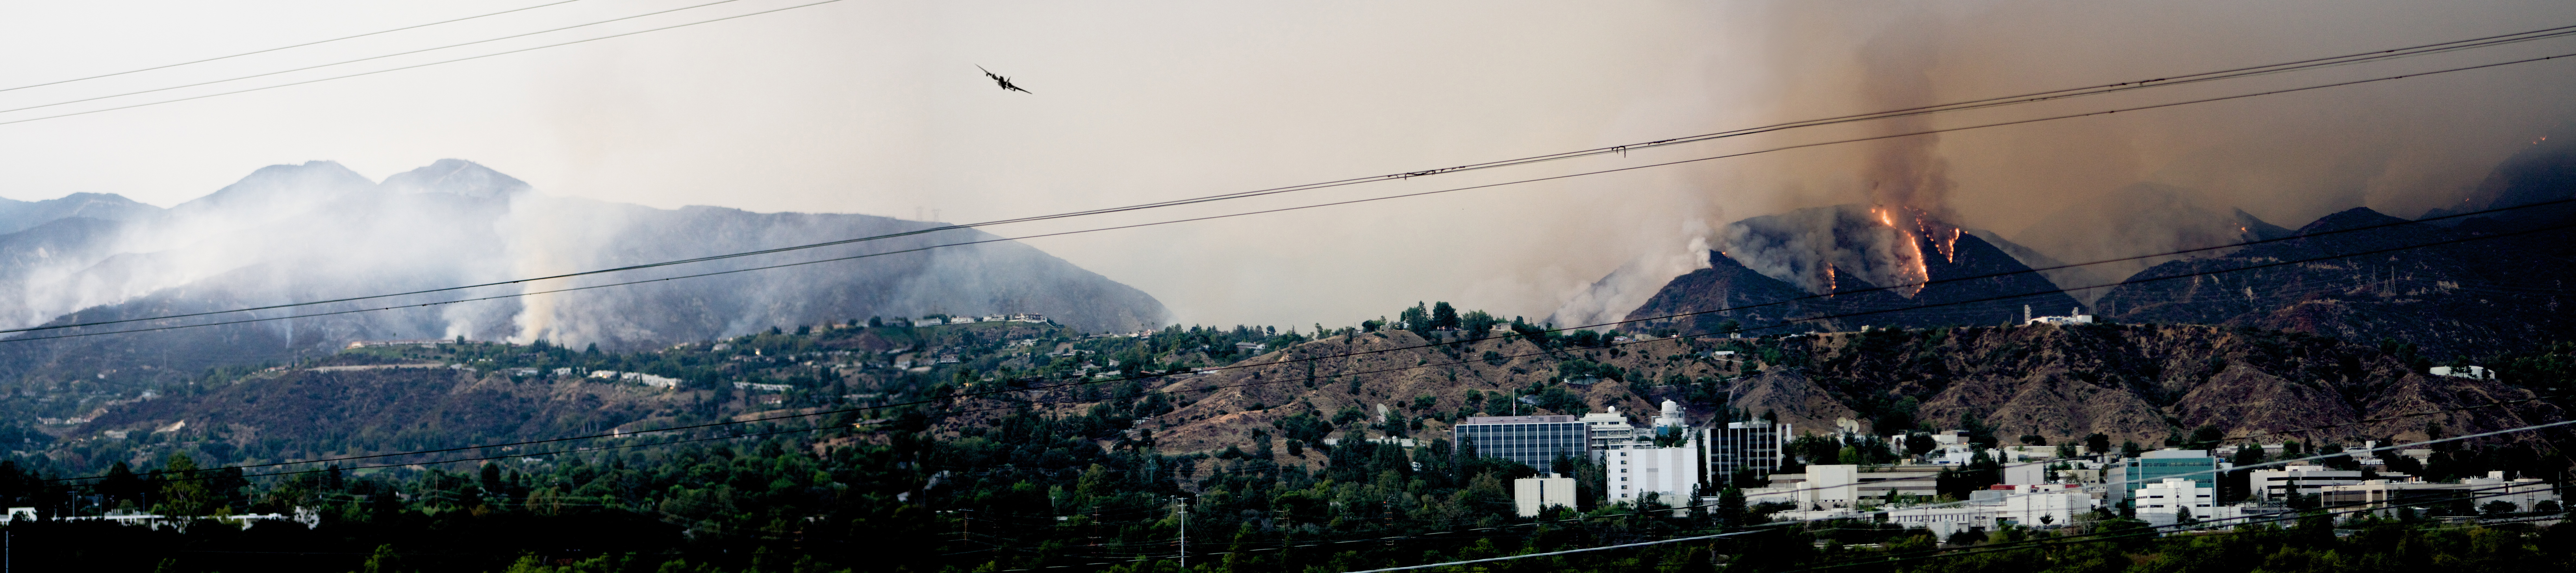 2009_California_Wildfires_at_JPL_-_Pasadena%2C_California.jpg